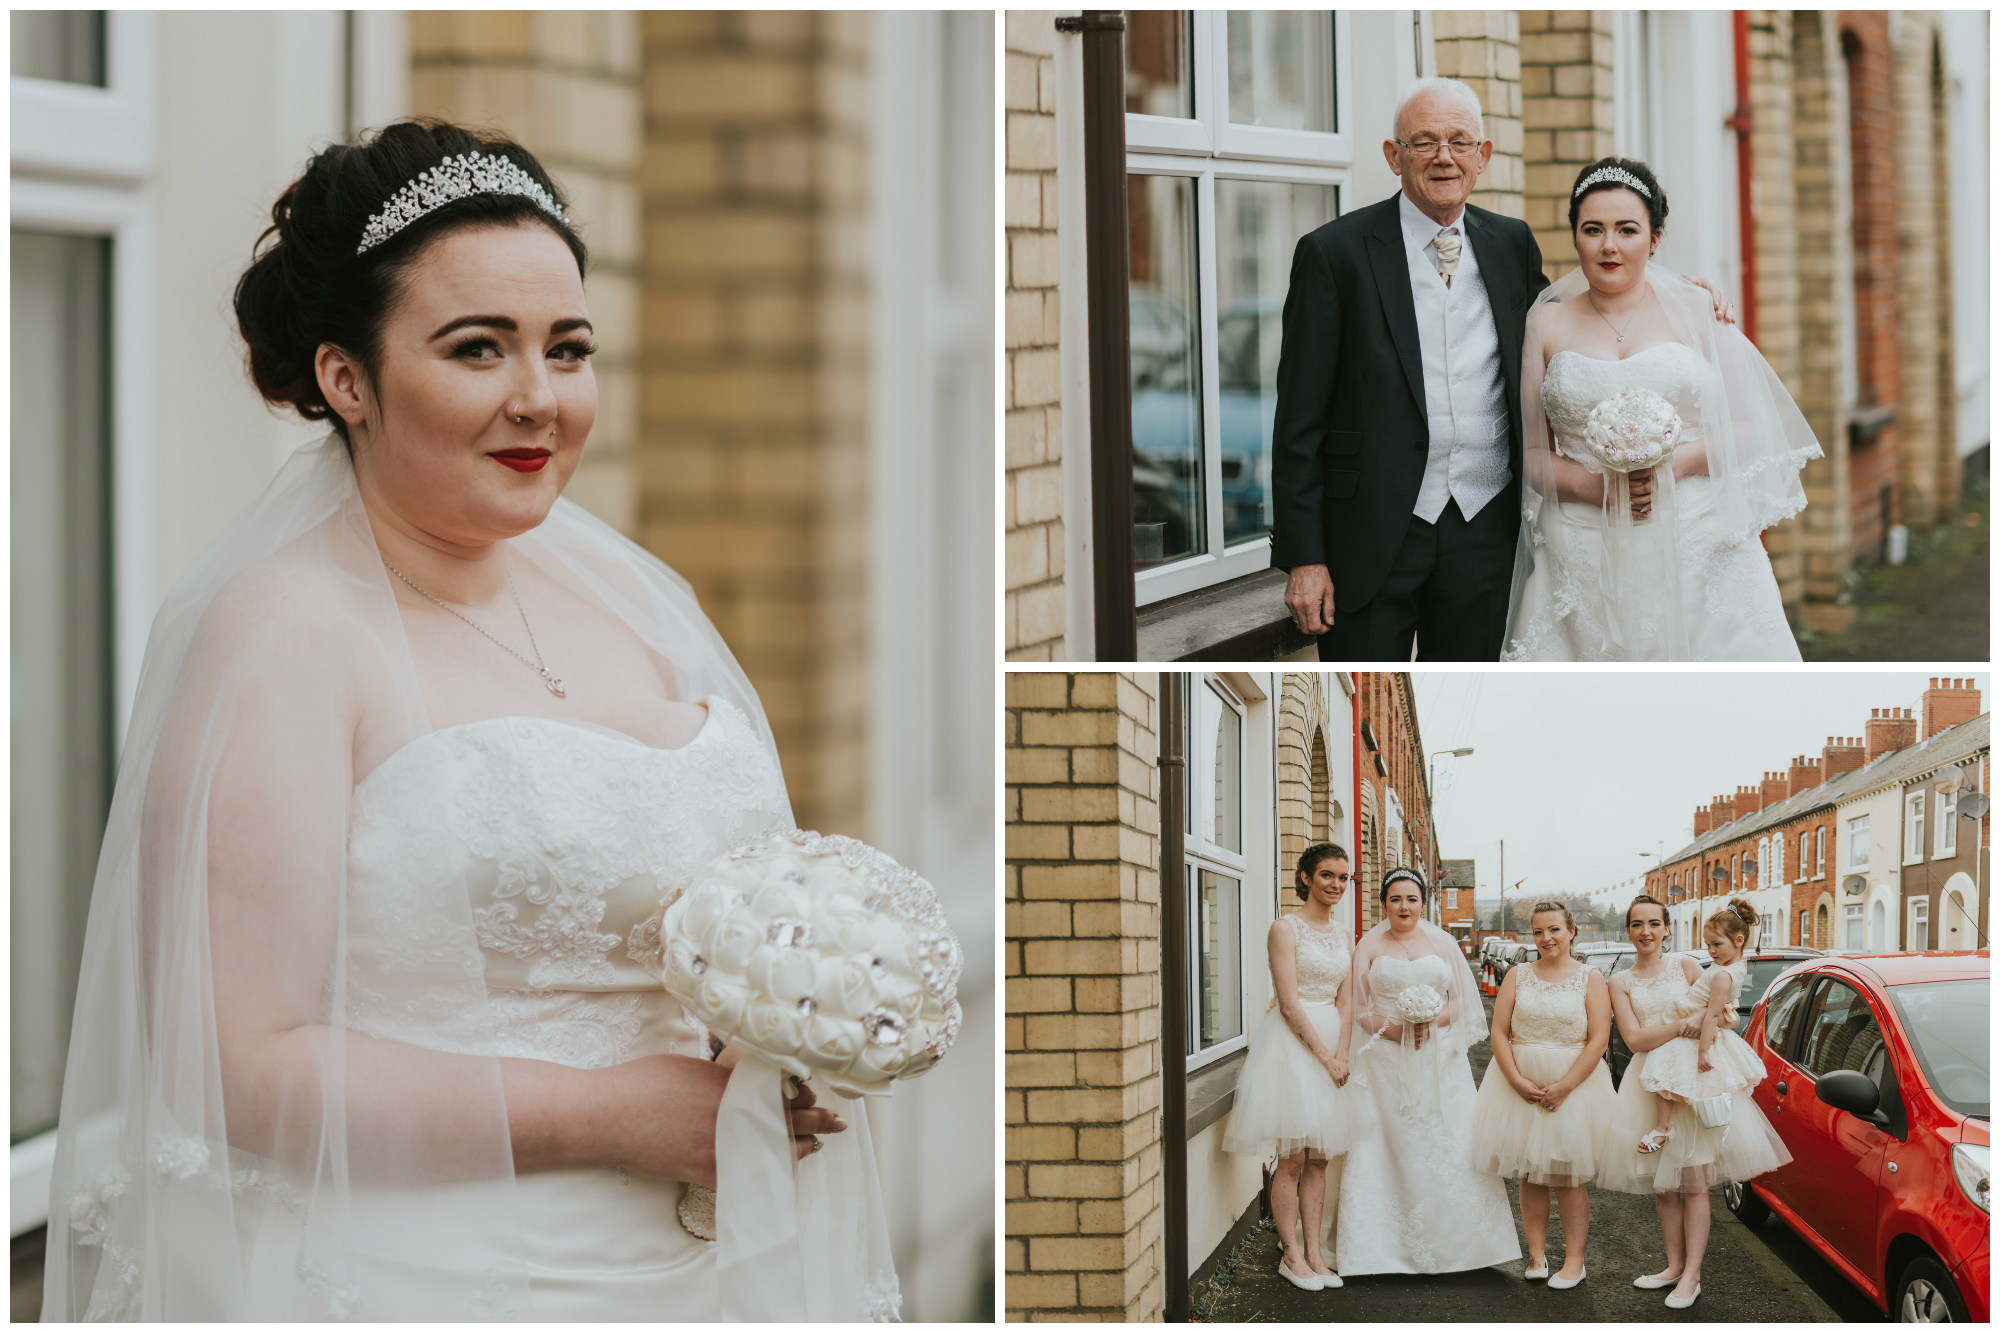 ten square hotel wedding getting ready bride bridesmaid flower girl